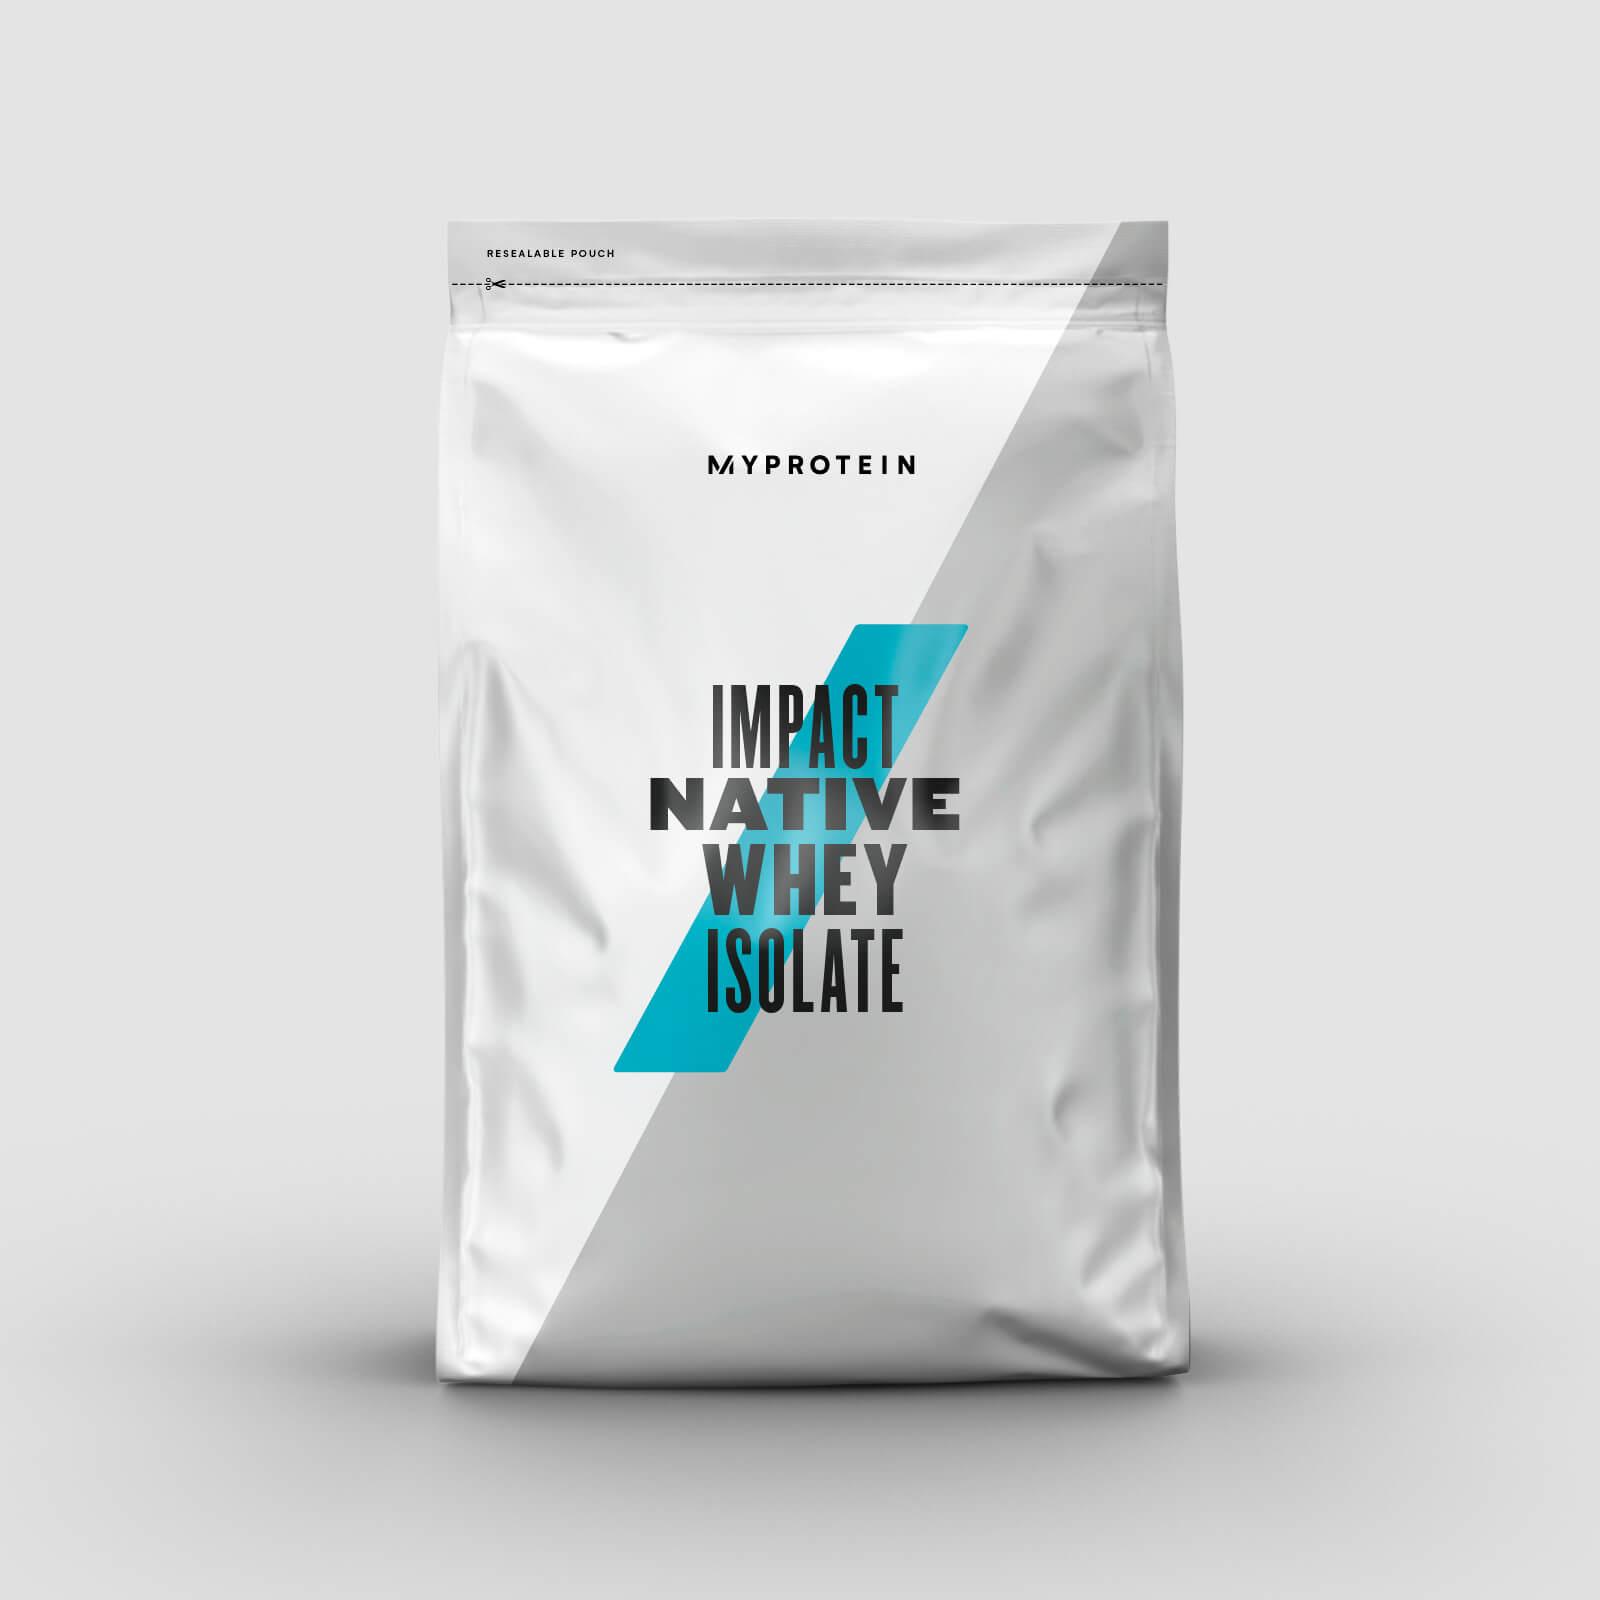 Купить Impact Native Whey Isolate (Изолят сывороточного белка) - 2.5kg - Натуральная клубника, Myprotein International